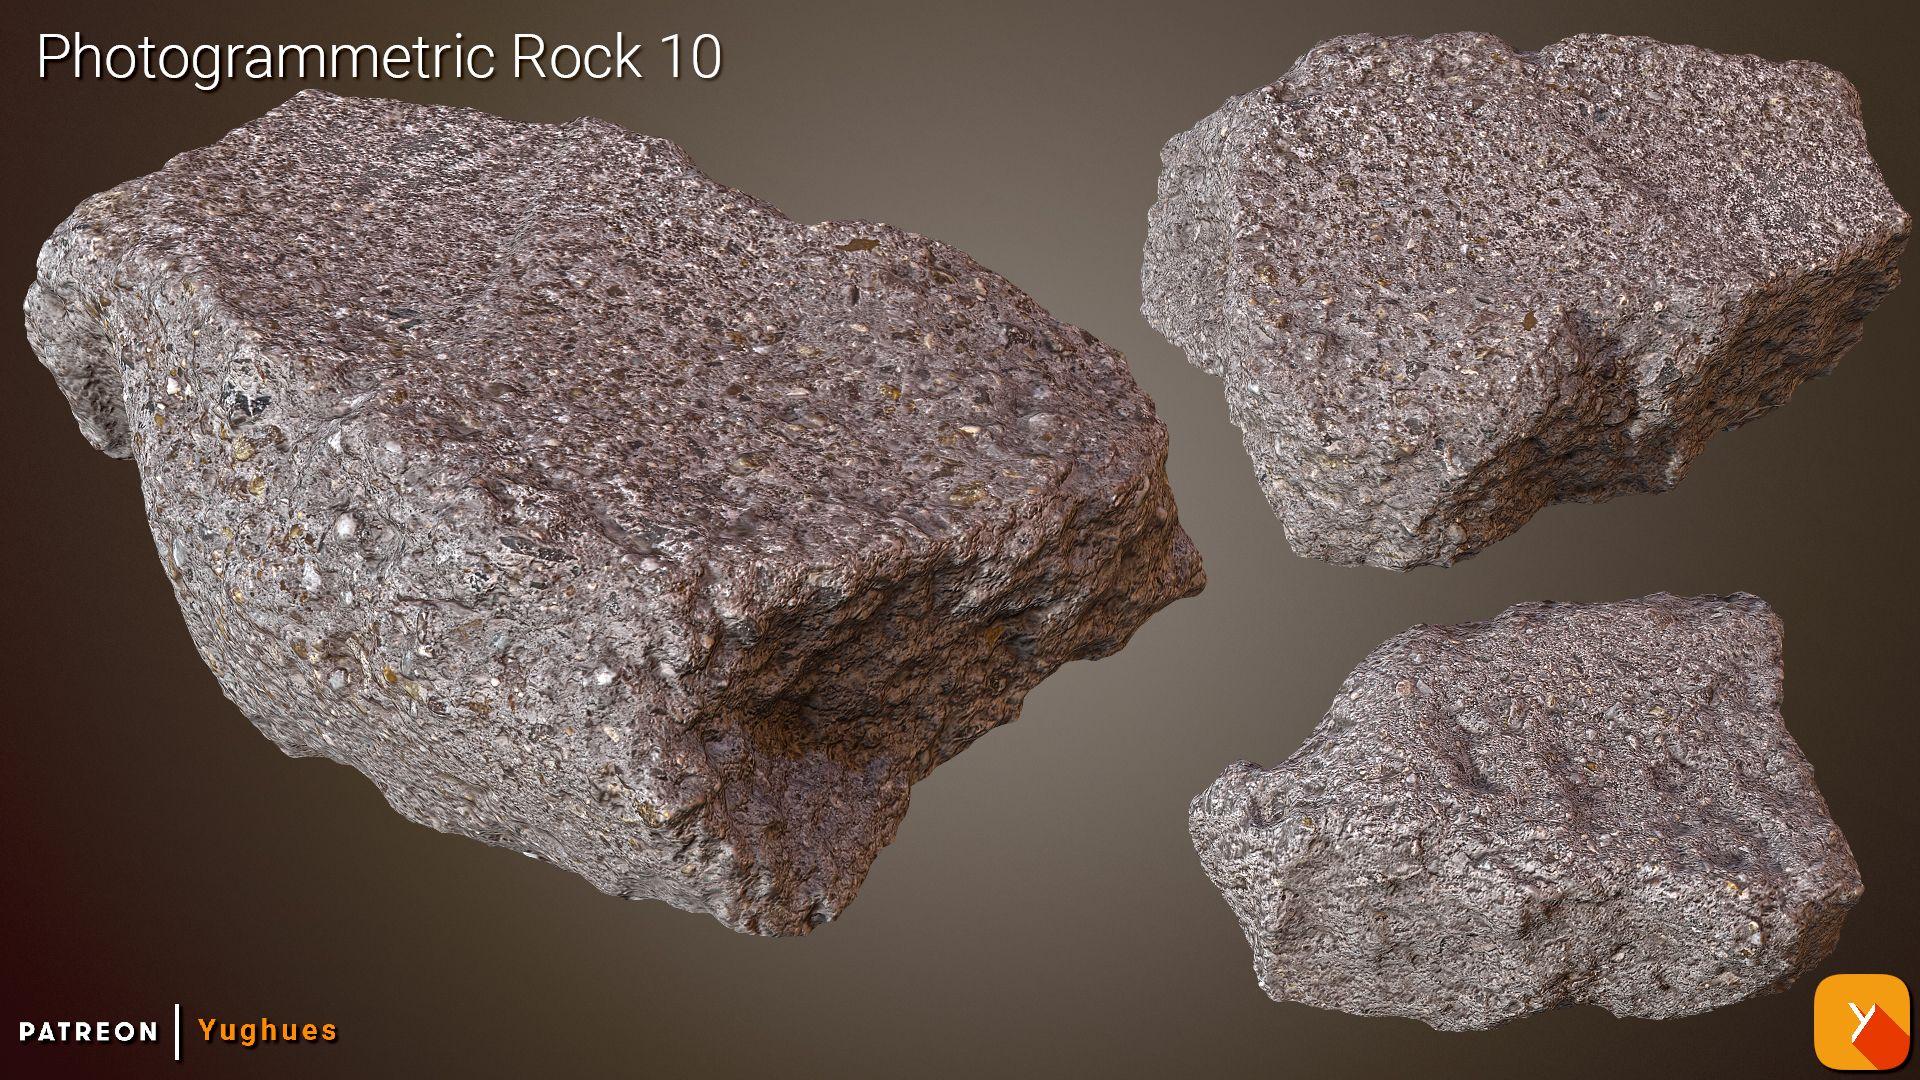 [Free] Photogrammetric Rock 10 (last) by Yughues